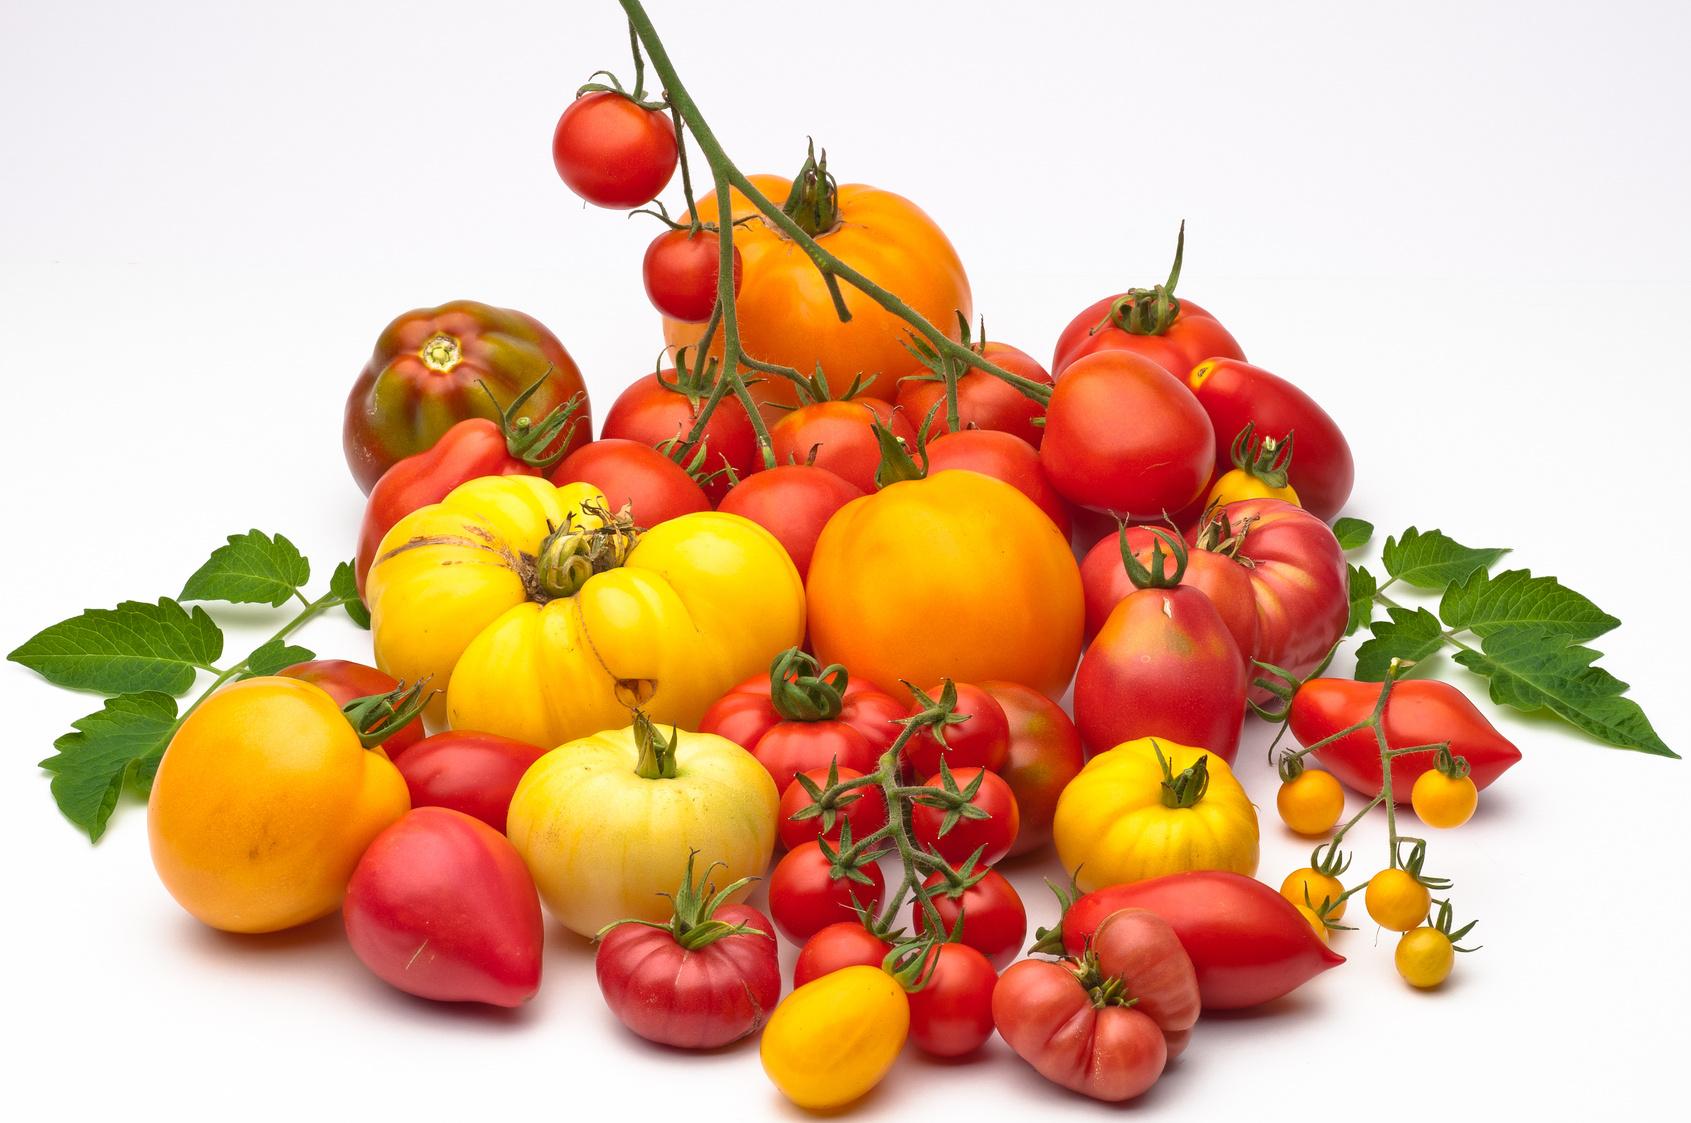 Steckbrief Tomate